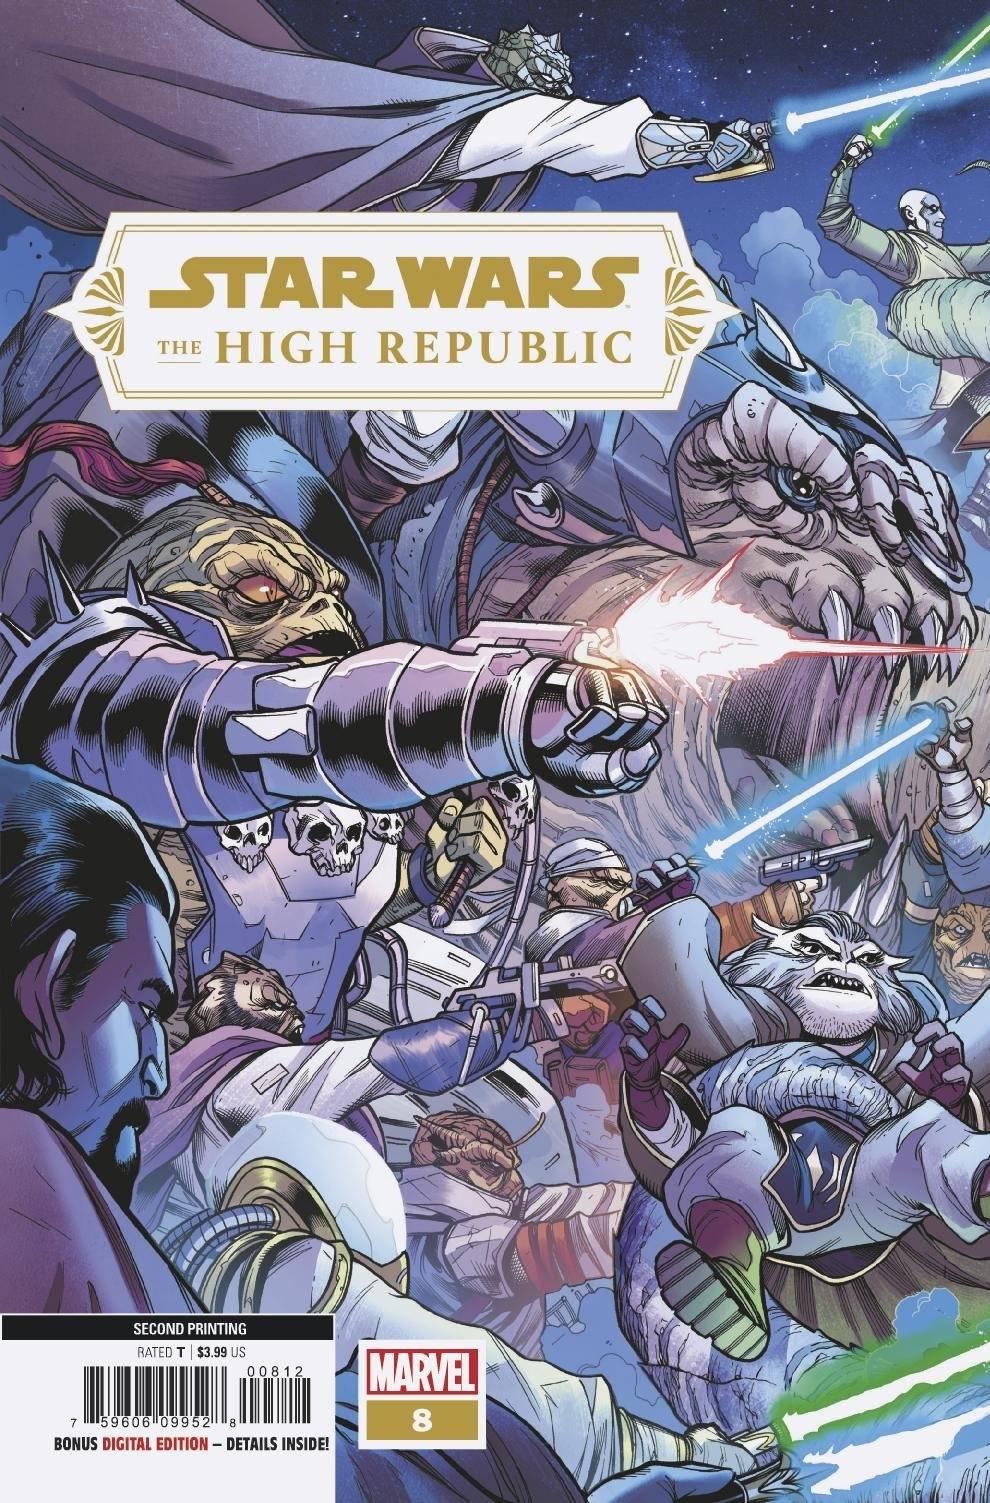 The High Republic #8 (2nd Printing) (29.09.2021)